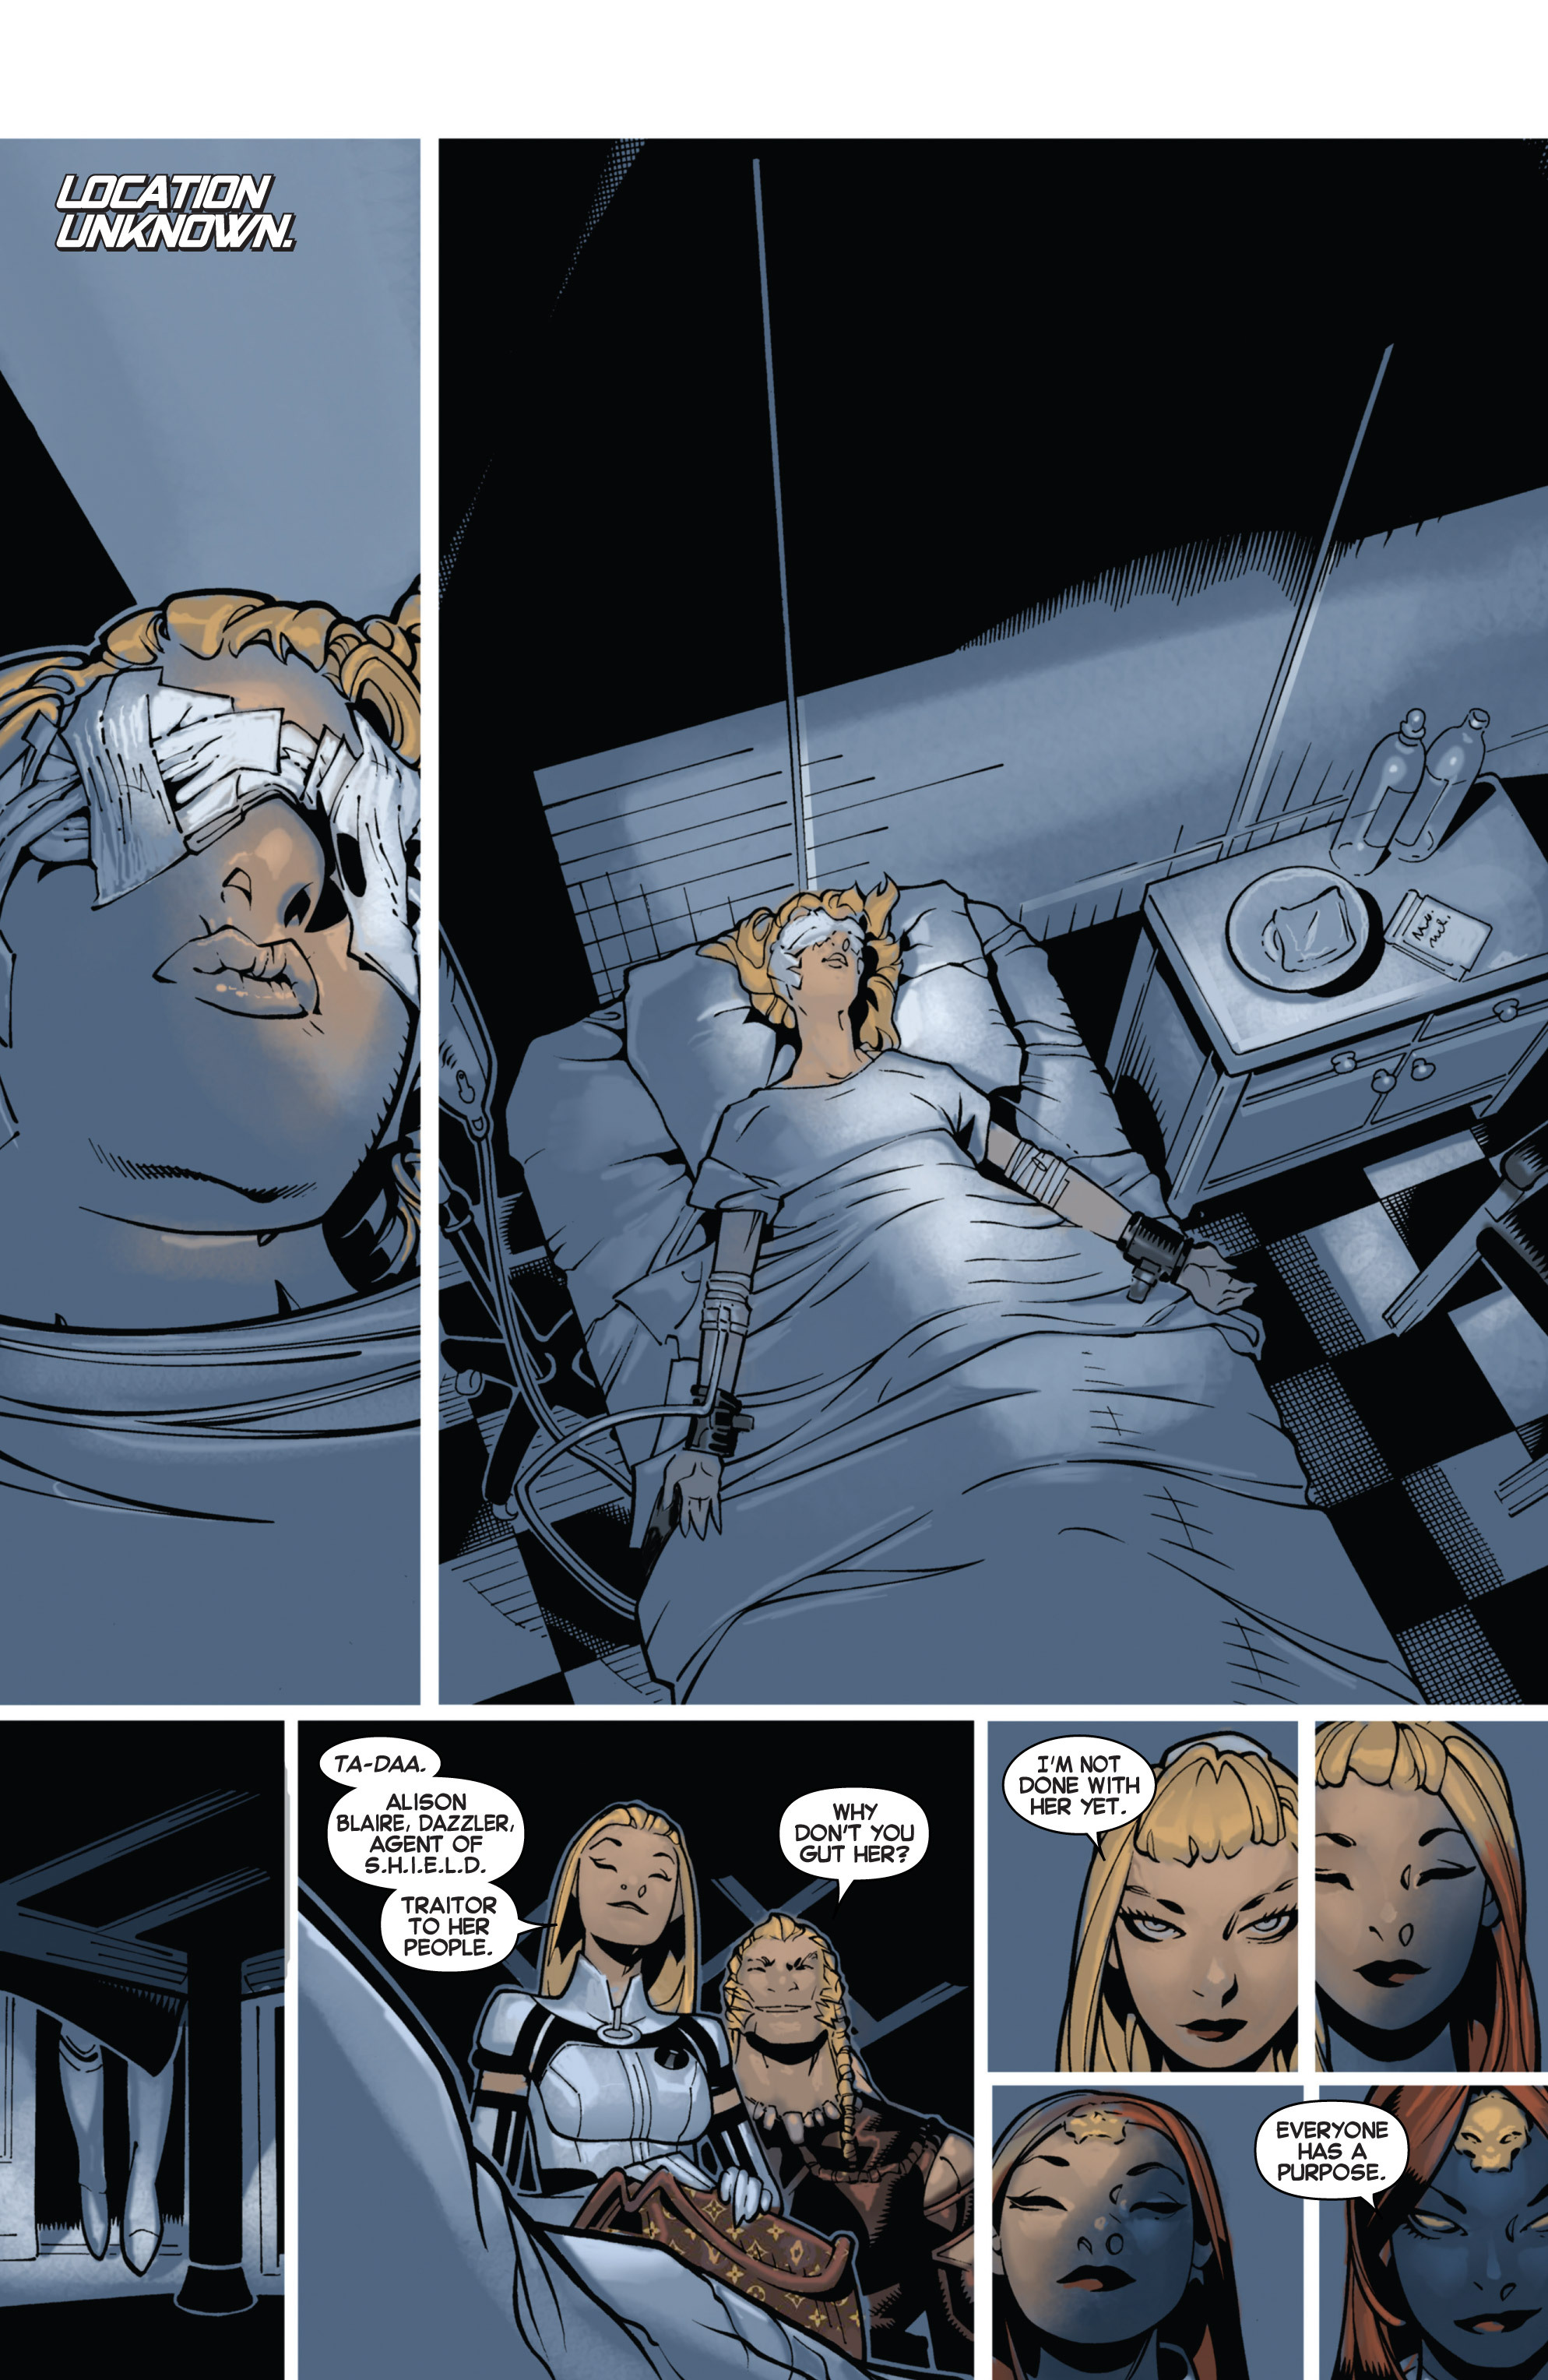 Read online Uncanny X-Men (2013) comic -  Issue # _TPB 4 - vs. S.H.I.E.L.D - 6